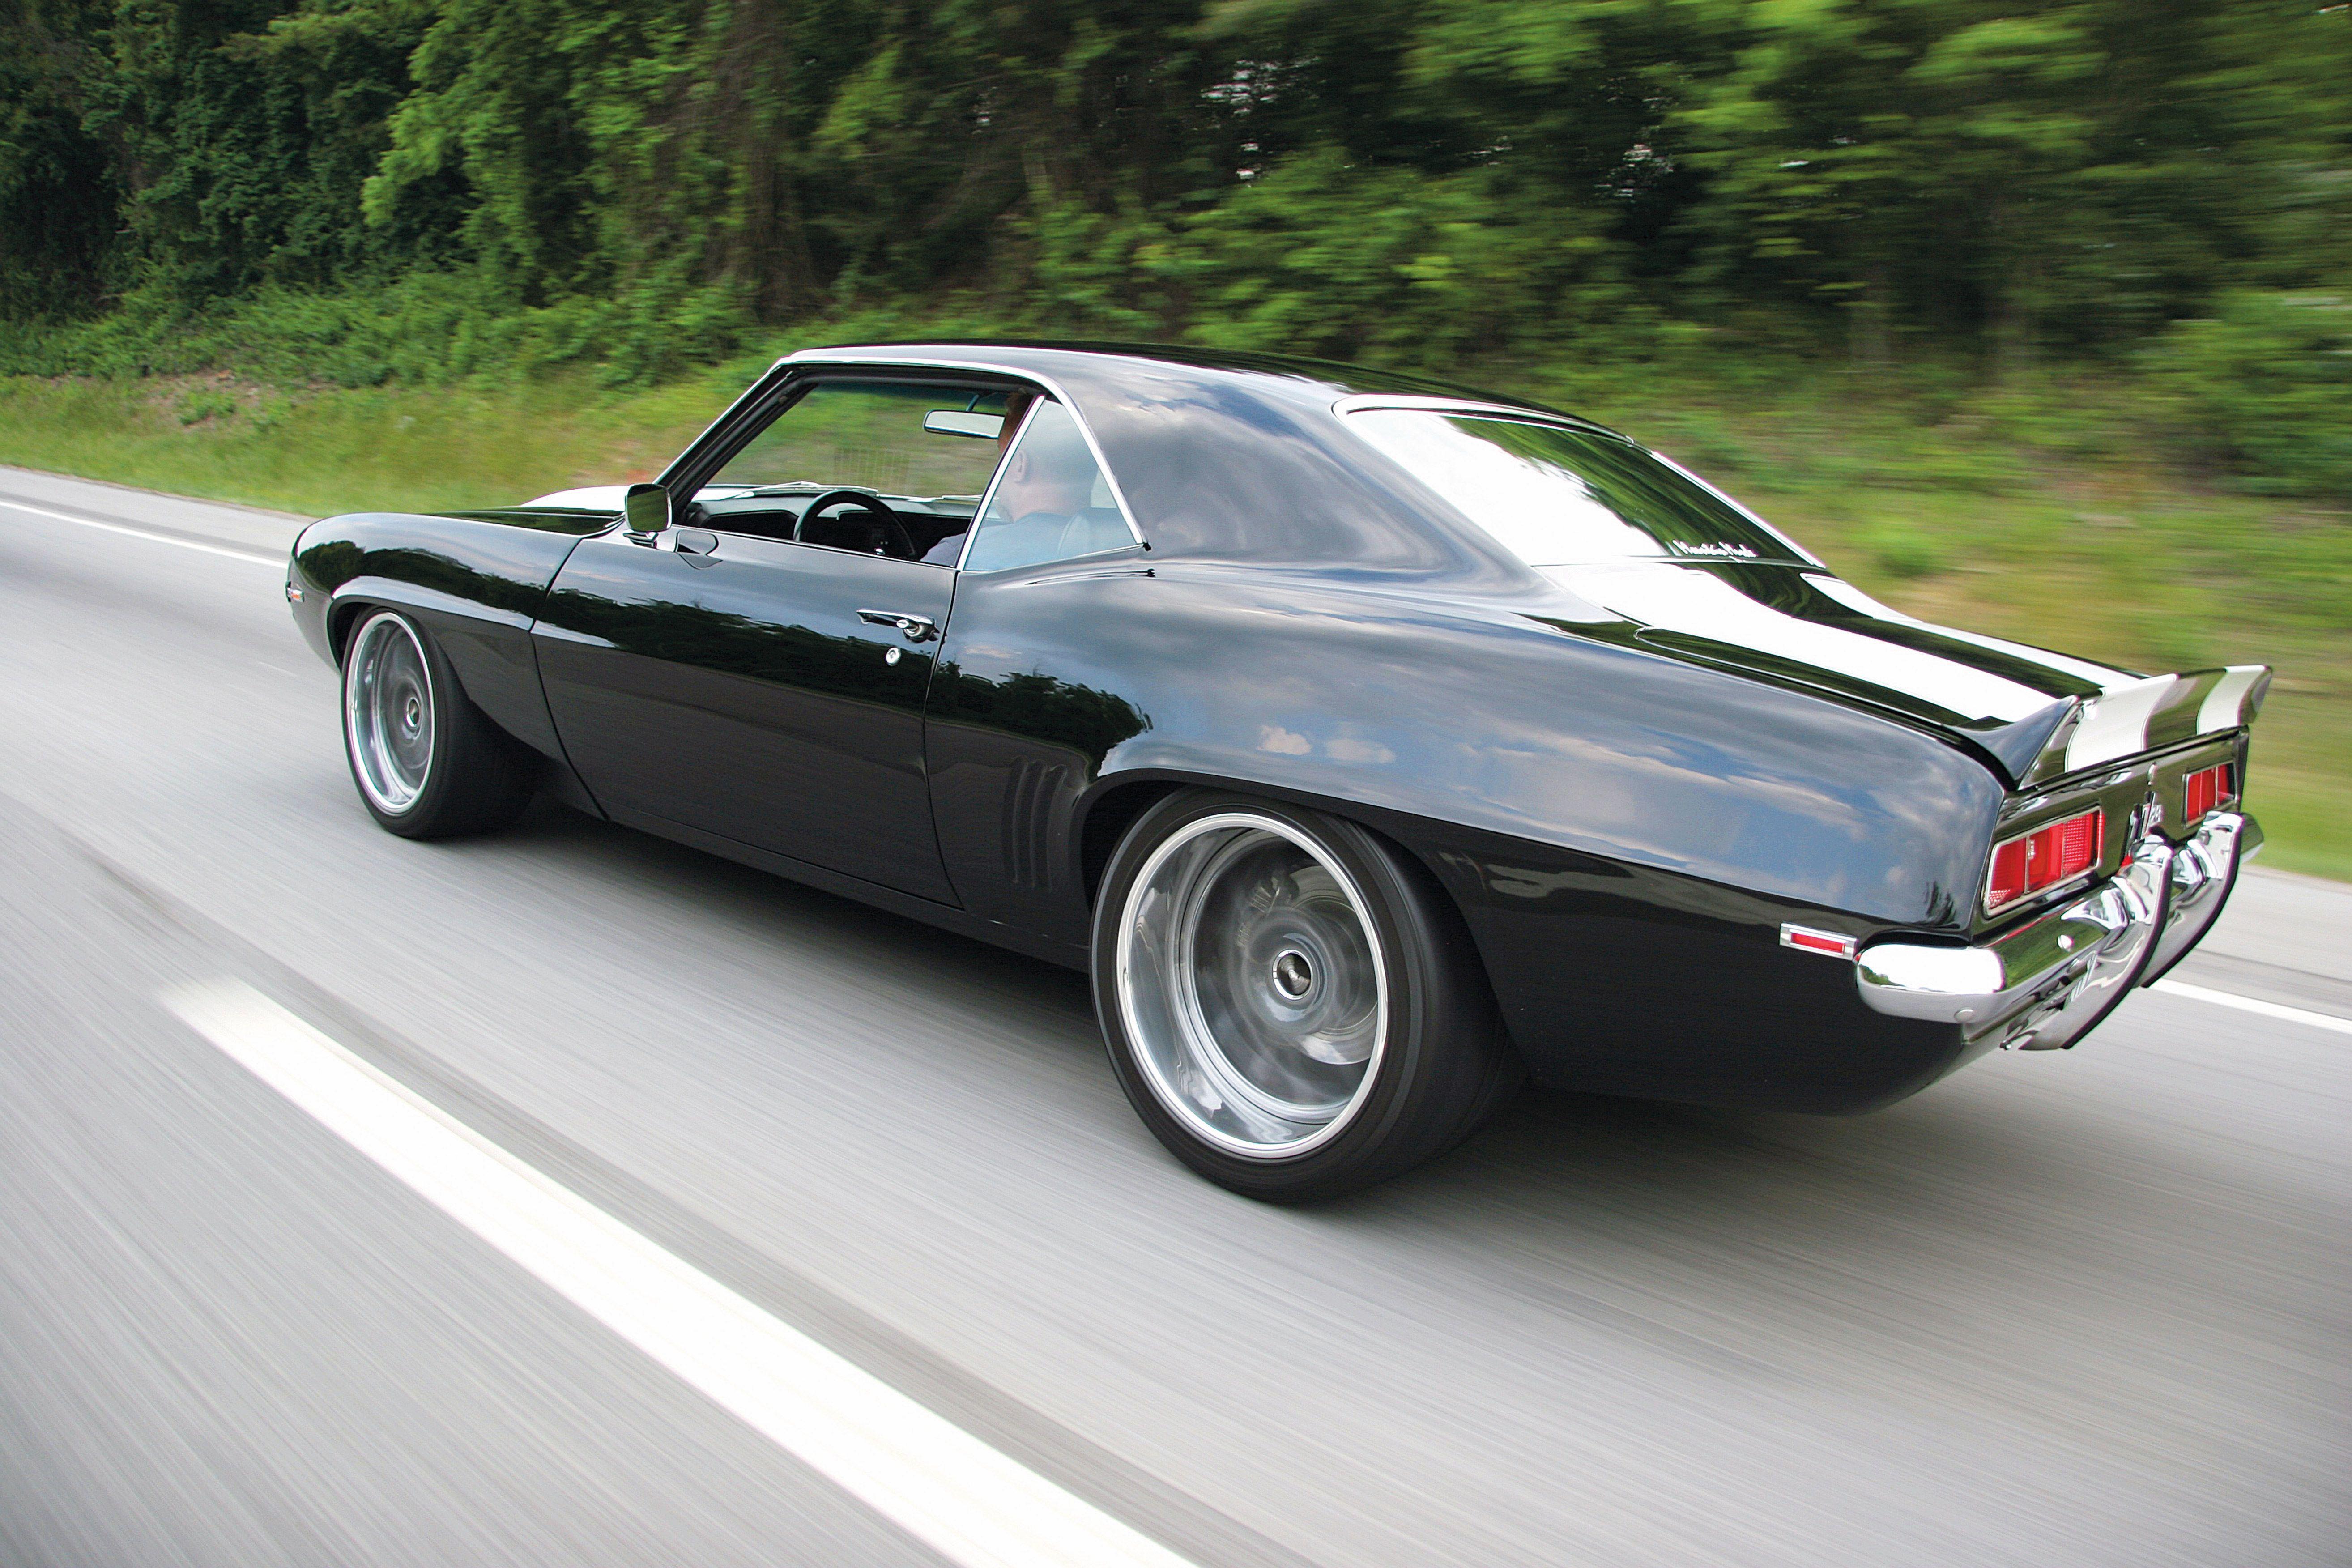 1969 chevrolet camaro pro touring 406 900 hp 6 speed boyd coddington wheels 5 star billet chevys and more pinterest boyd coddington chevrolet camaro